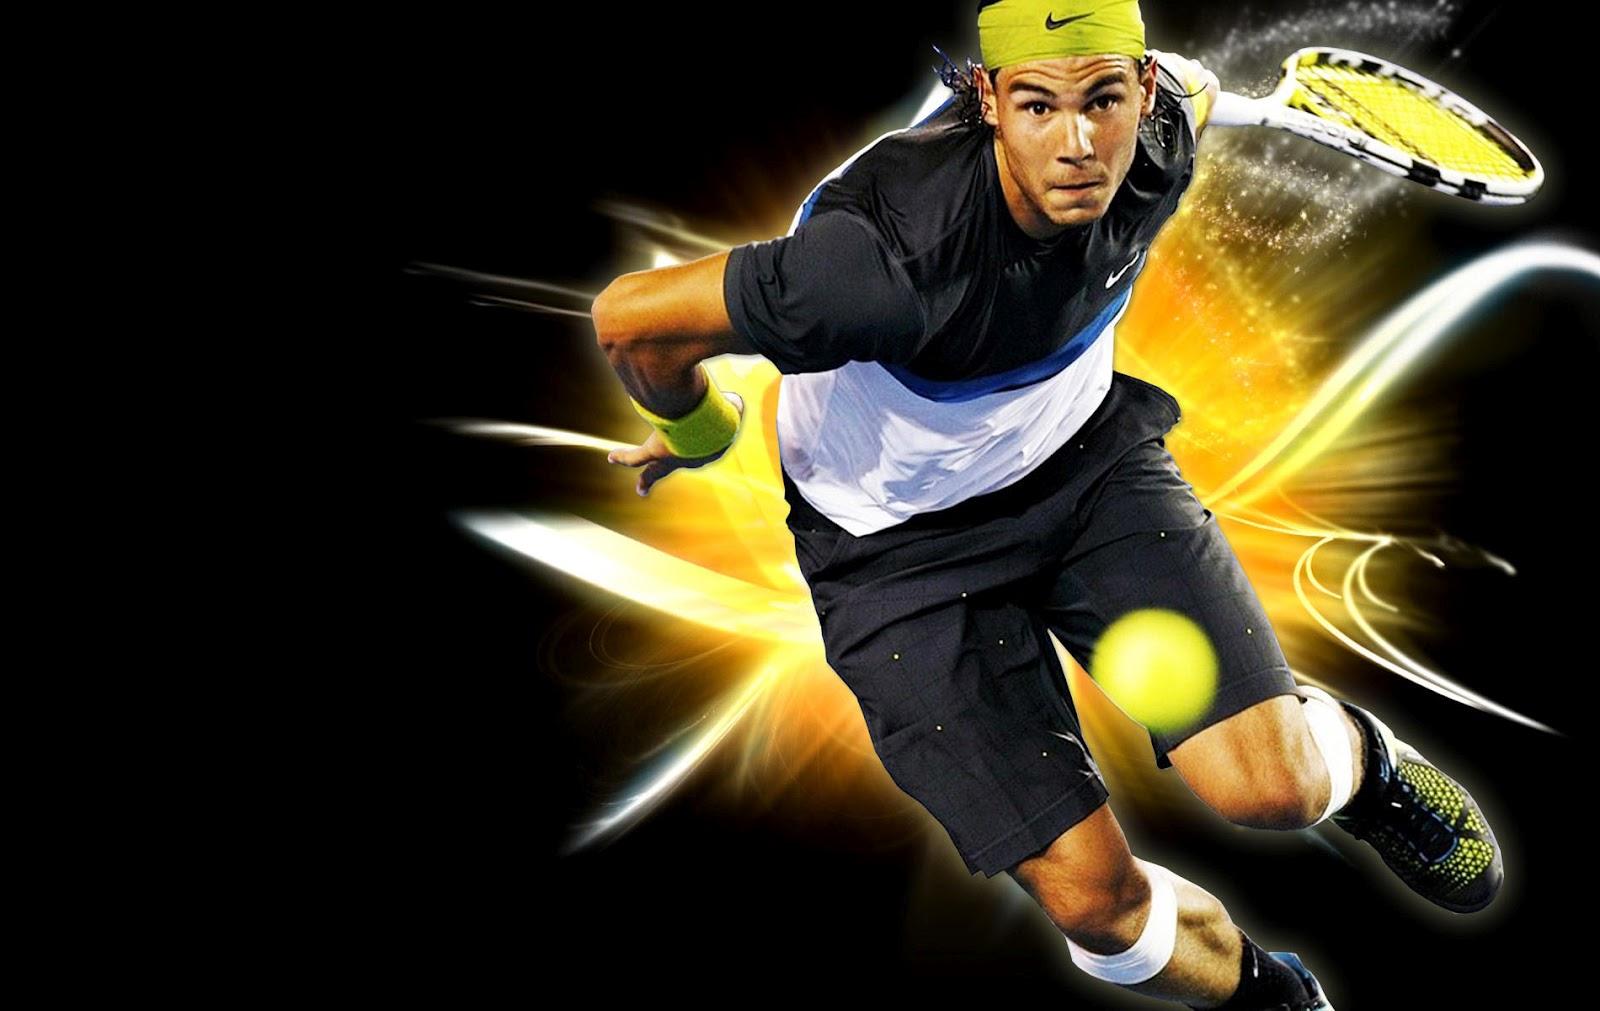 Nadal Hd: Sports Celebrity: Rafael Nadal HD Wallpaper